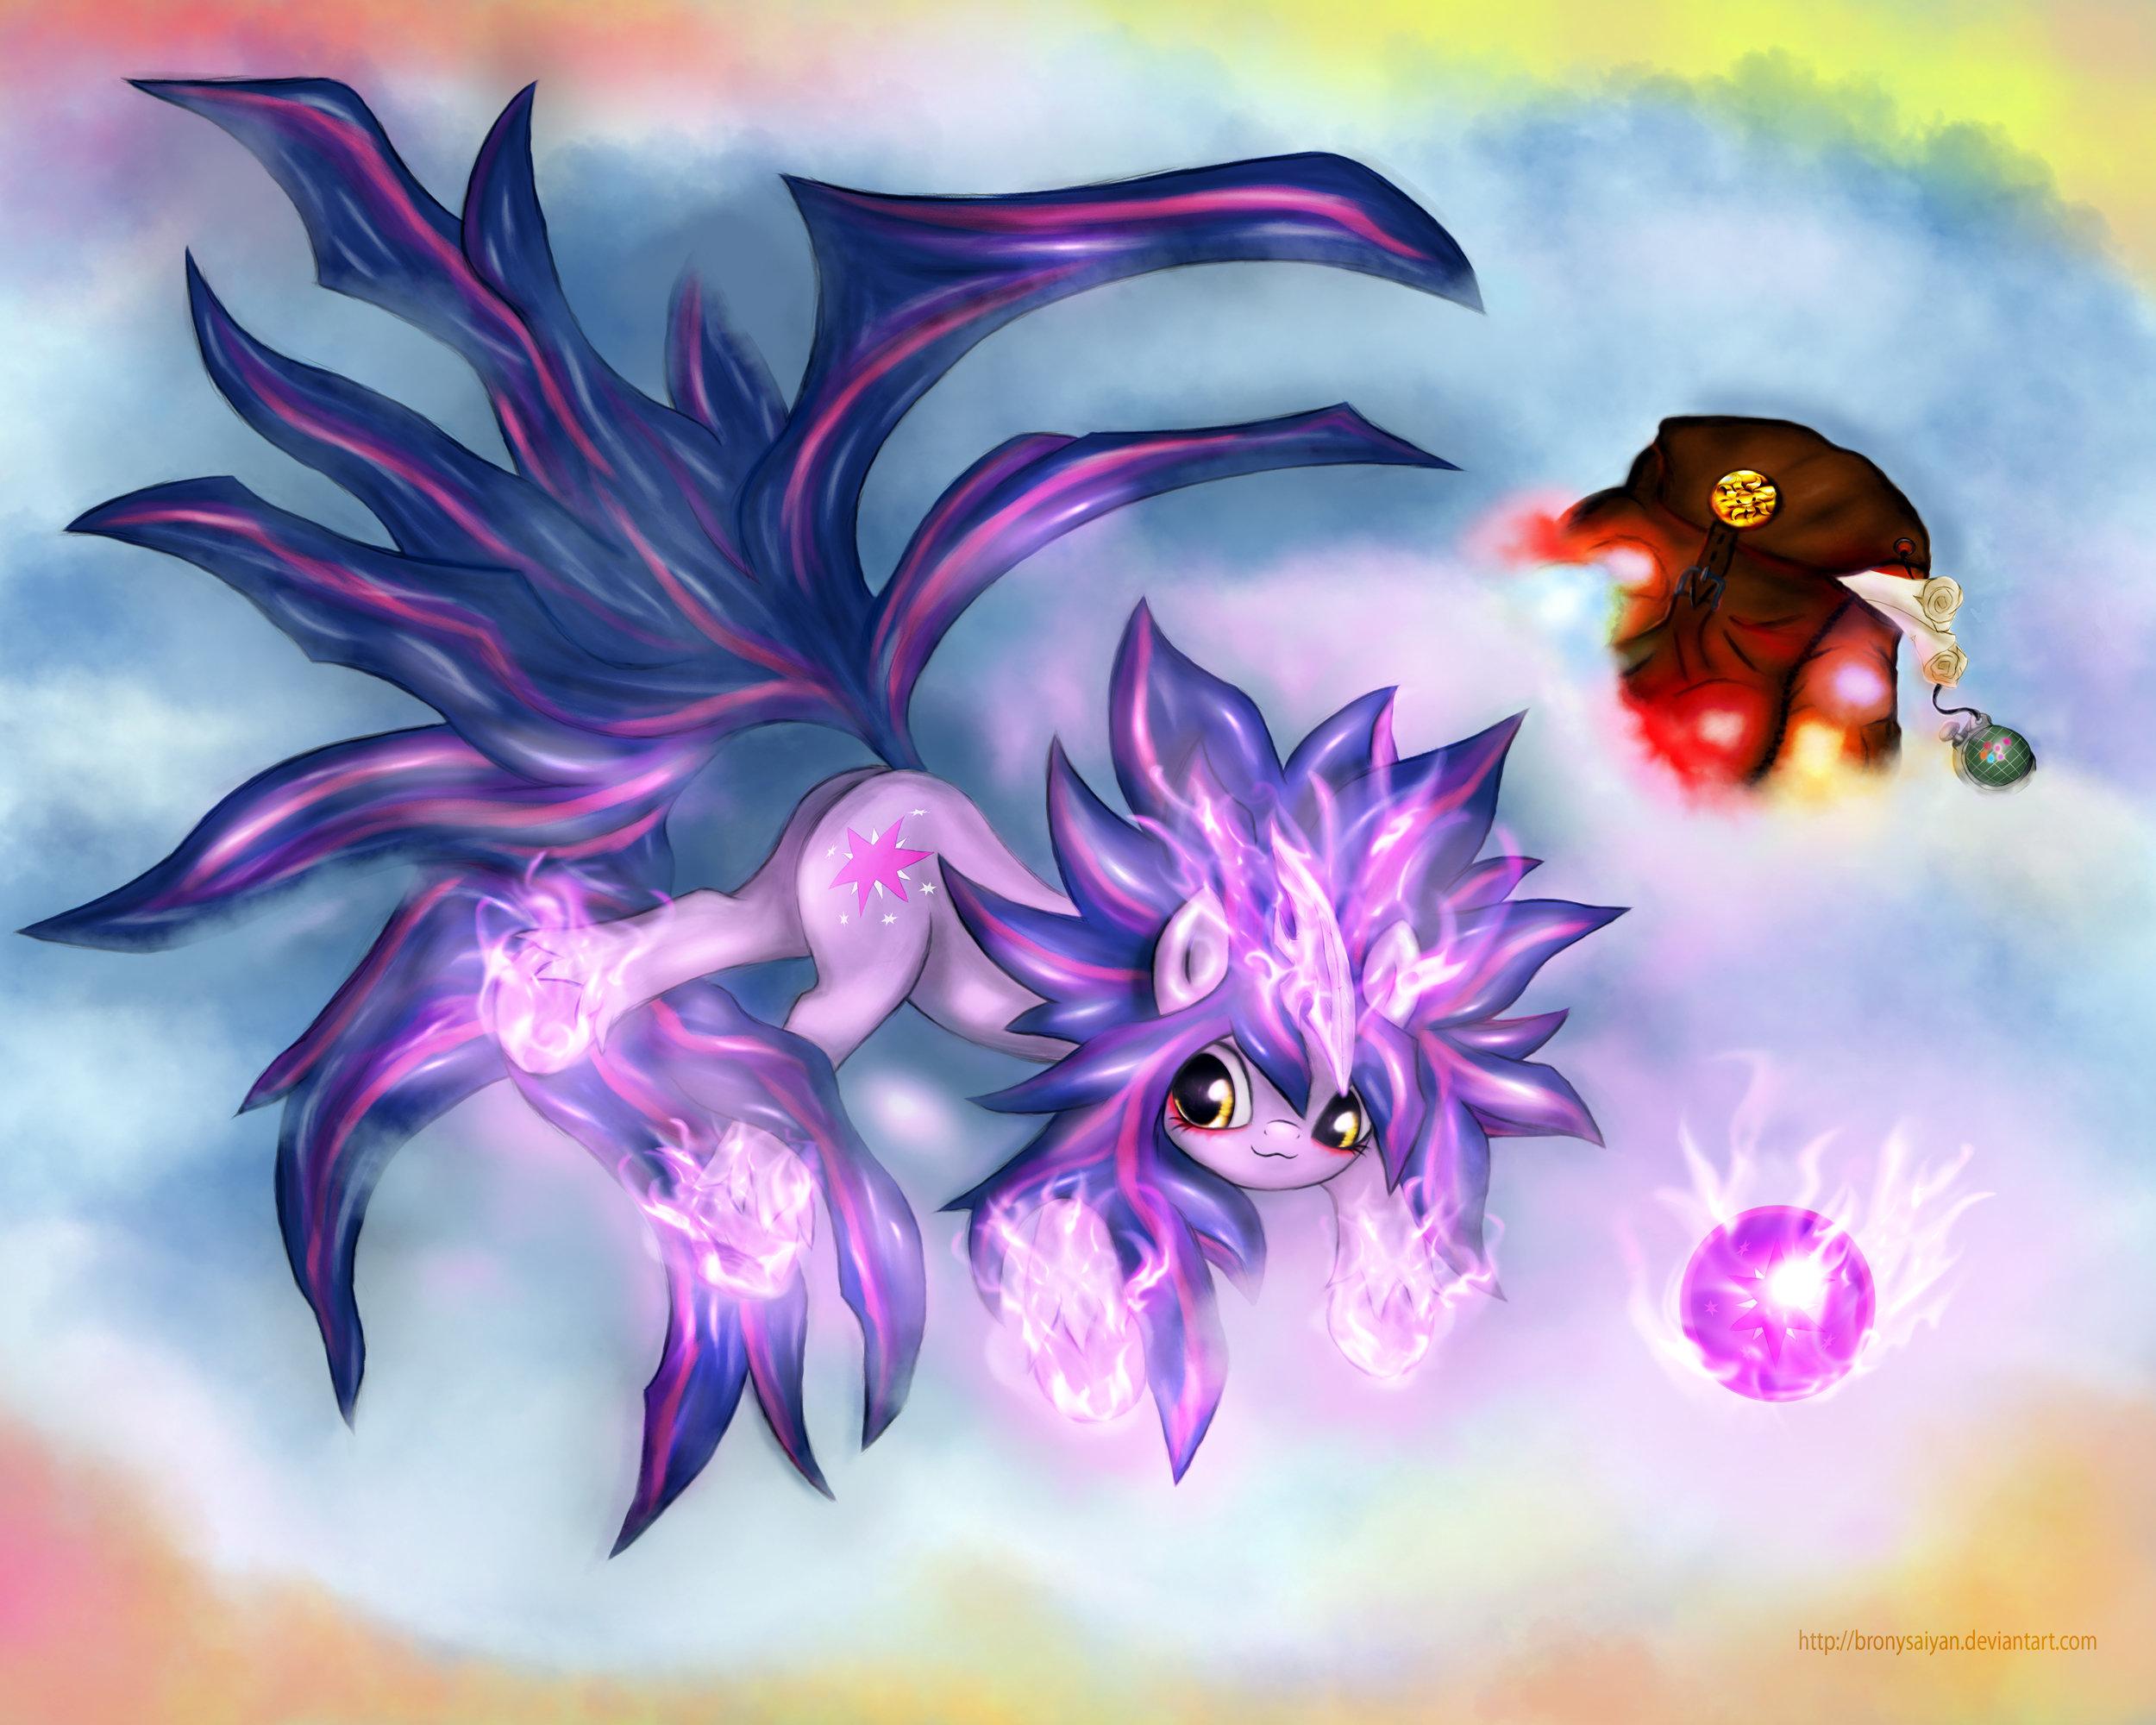 Twilight Super Saiyan 4 by BronySaiyan